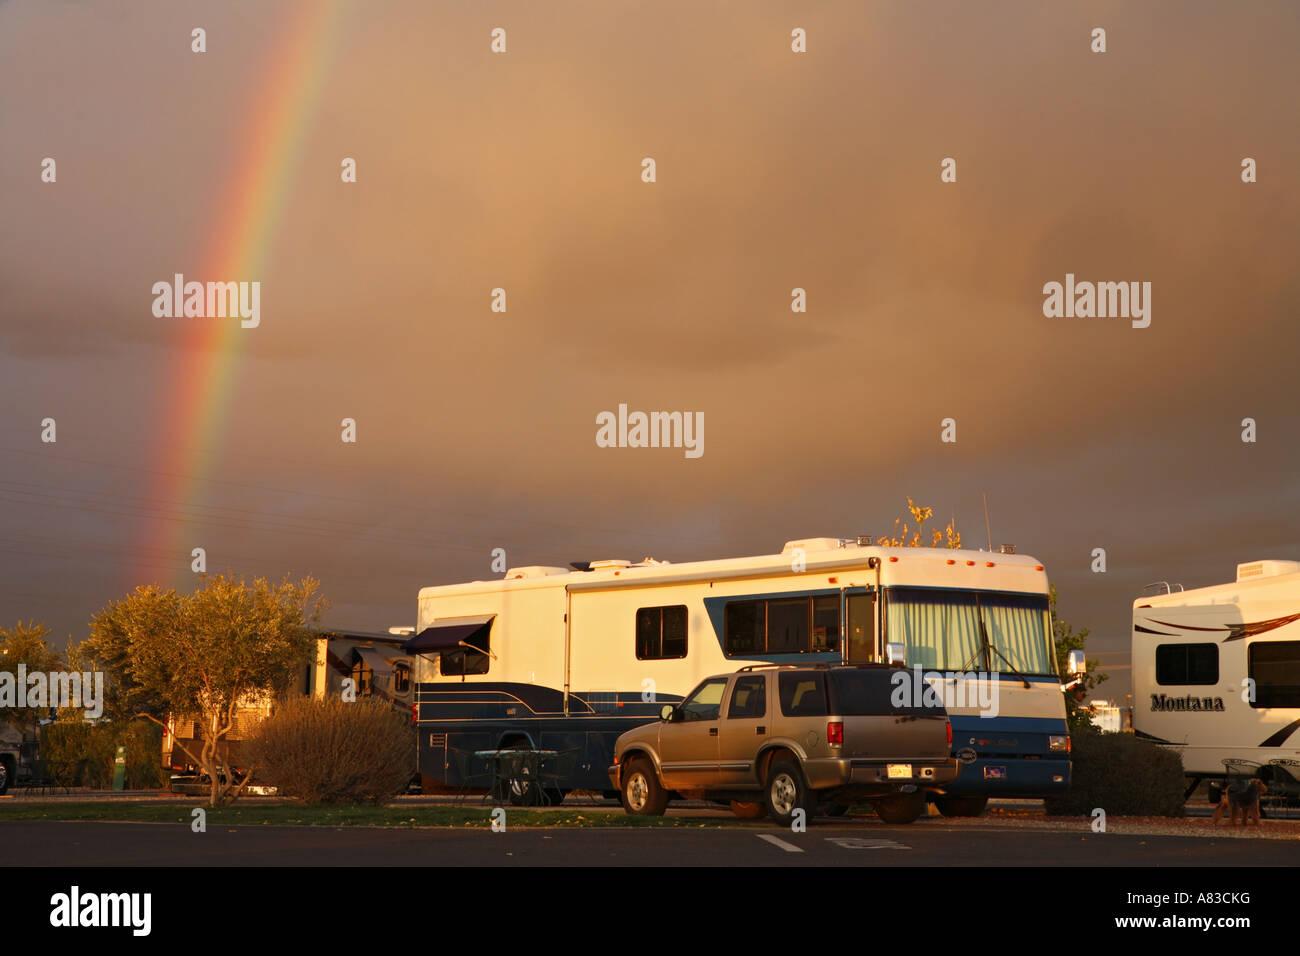 Beaudry RV Resort Tucson Arizona Stock Photo: 11974371 - Alamy